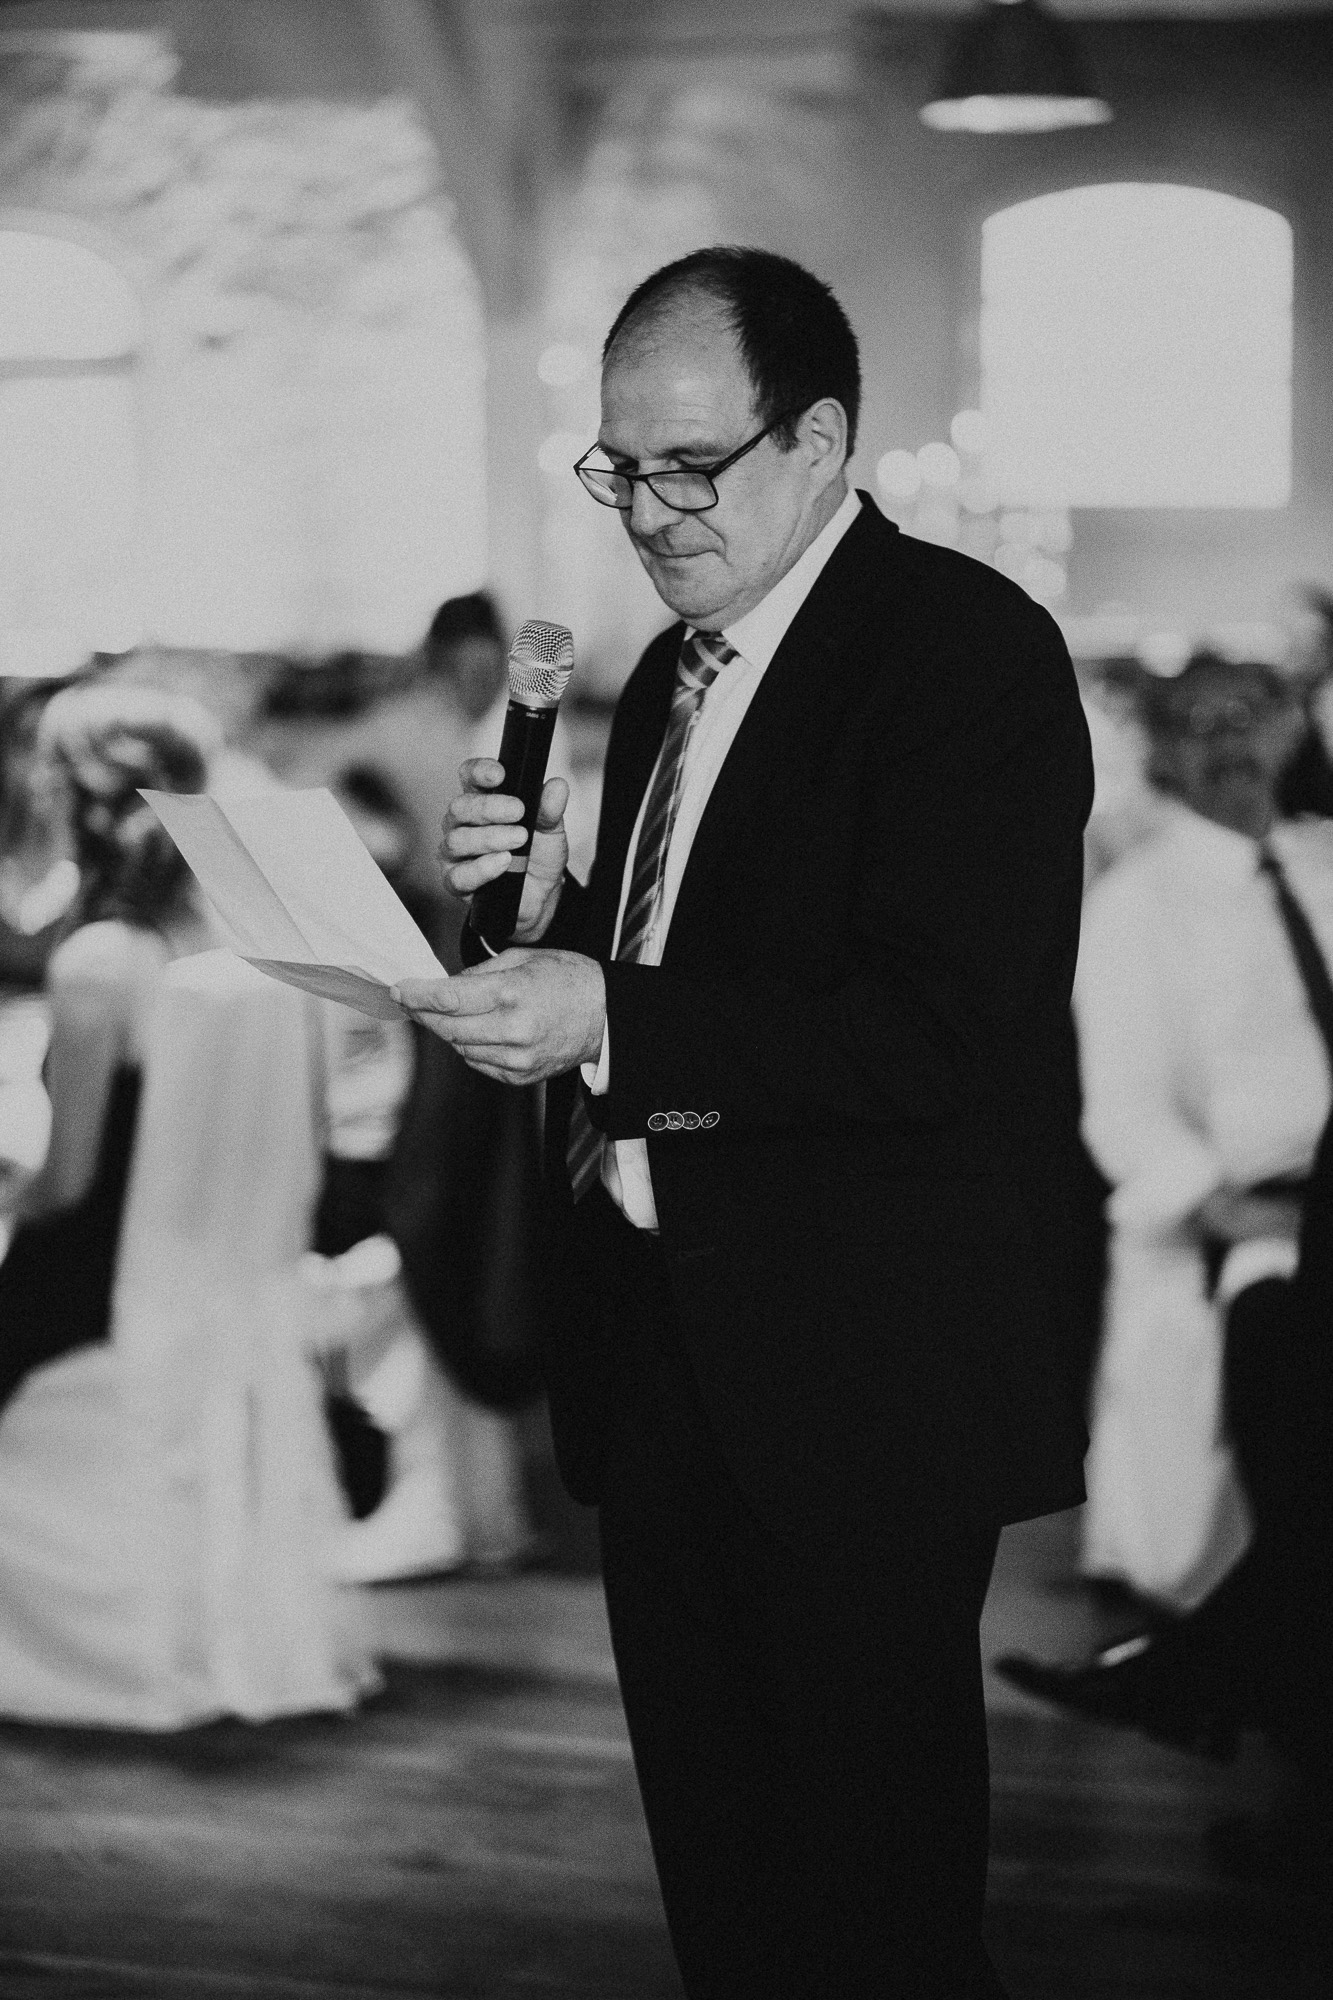 DanielaMarquardtPhotography_Hochzeitsfotograf_Düsseldorf_Köln_Mallorca_Bayern_Austria_Harz_Wedding_AileenundLennart_Weddingphotographer_Ibiza_Tuskany_Italien_Toskana_Portugal_Lissabon230